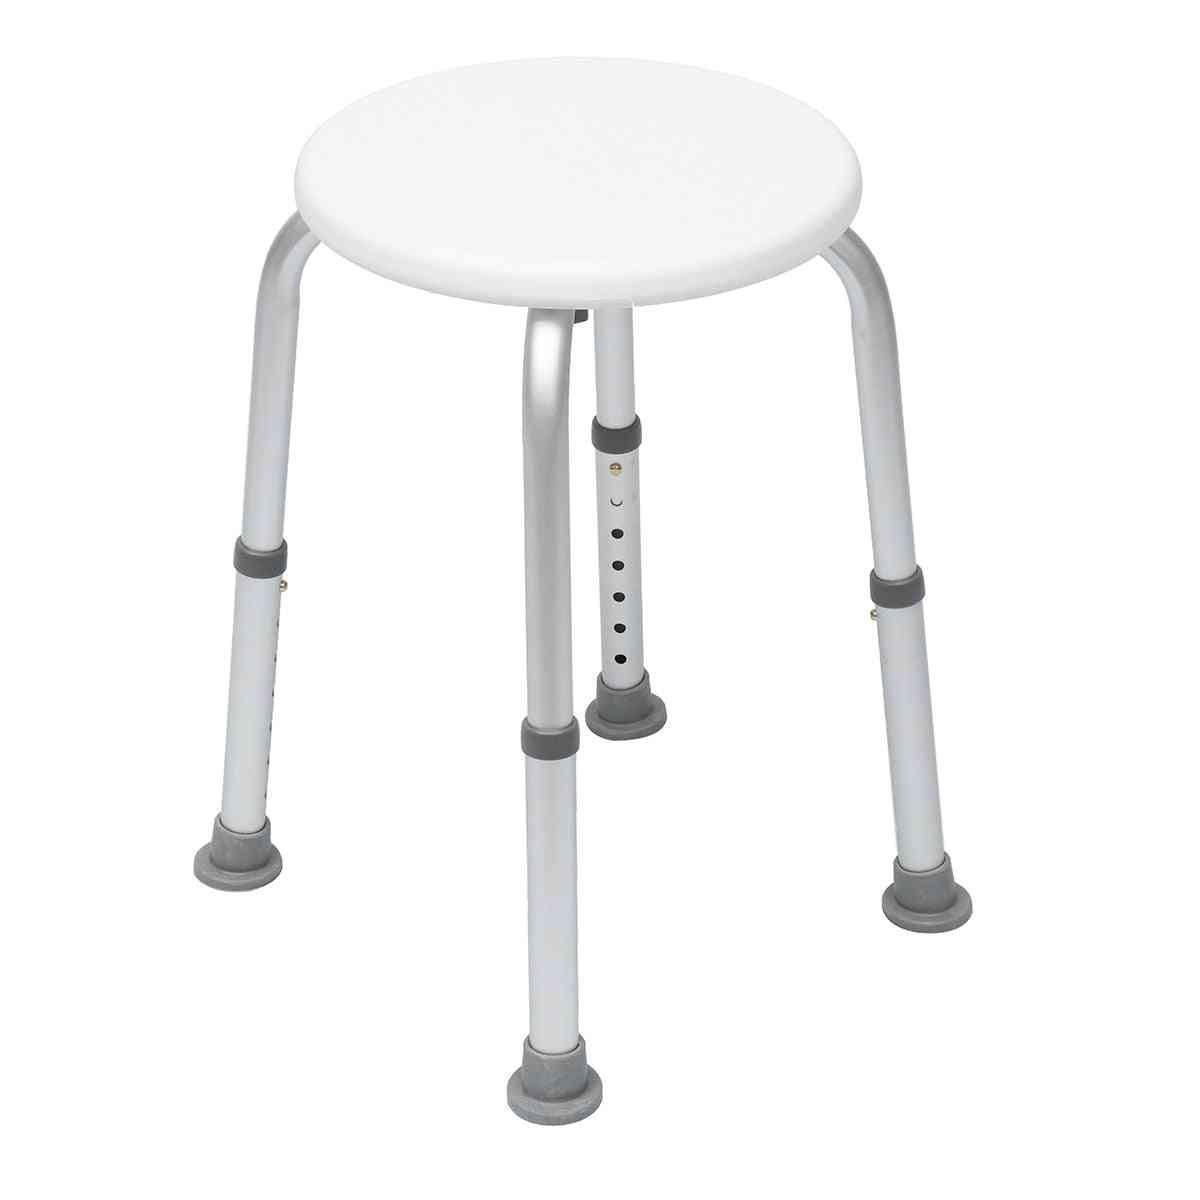 Anti-slip Bath Shower Chair / Bench Bathtub Stool Seat